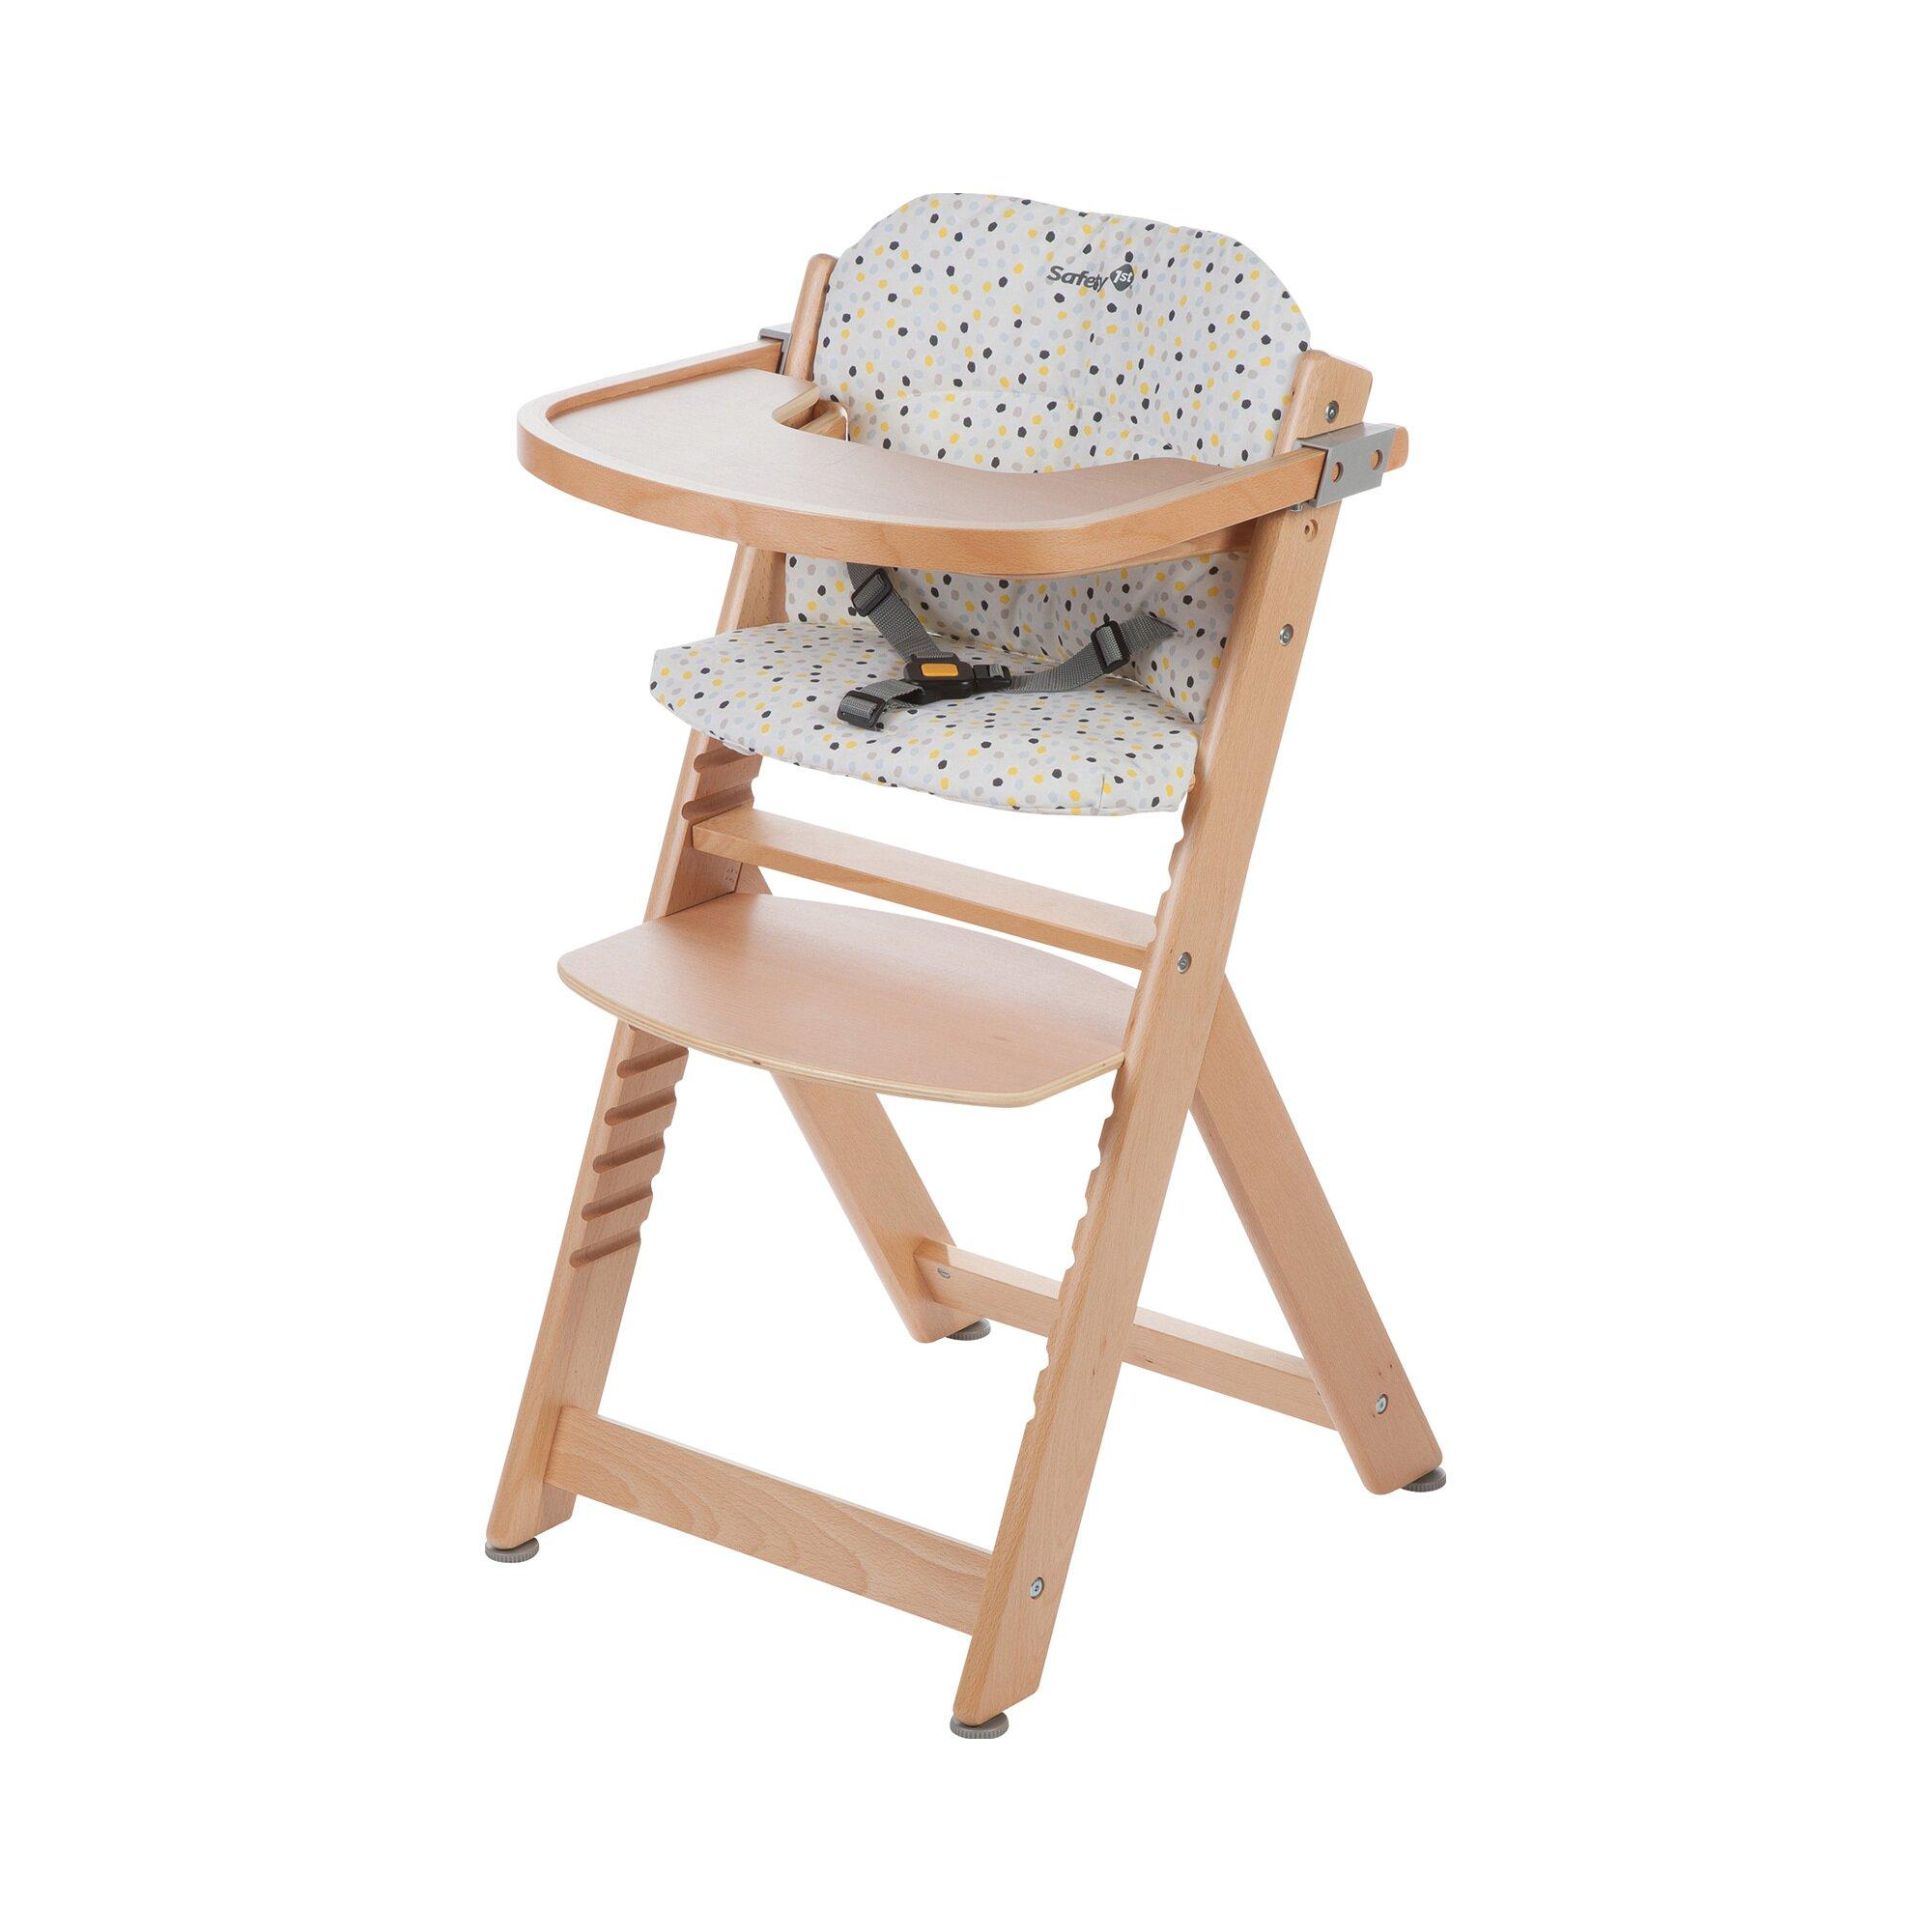 safety-1st-sitzkissen-fur-hochstuhl-timba-cushion